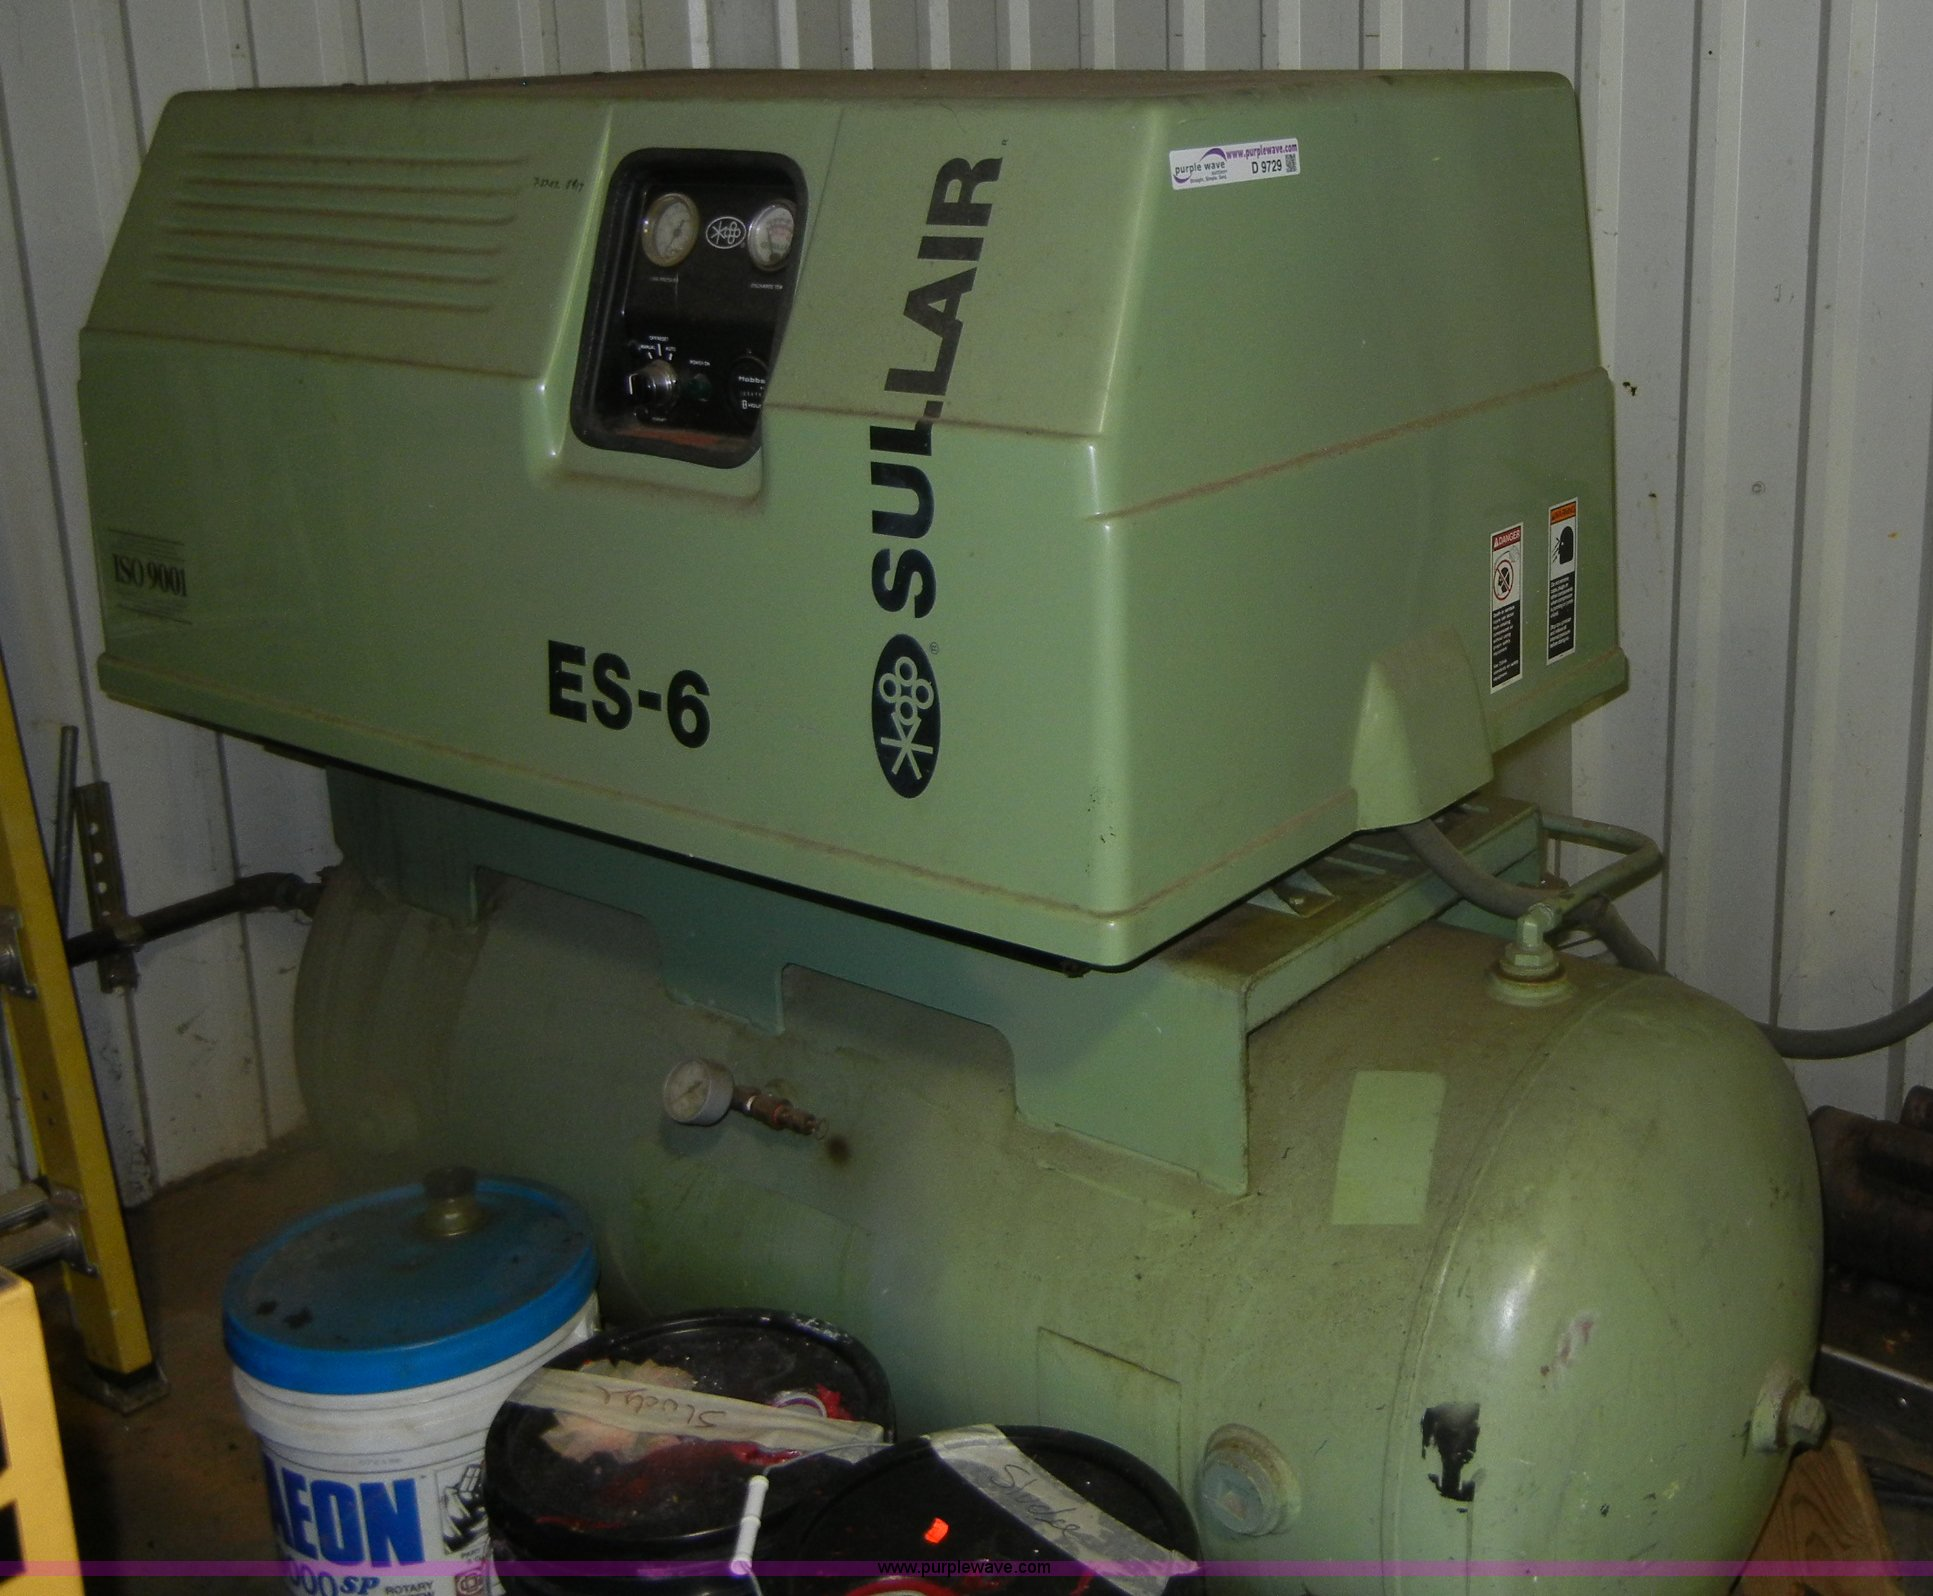 1998 sullair es 6 air compressor item d9729 sold septem rh purplewave com Sullair Manuals PDF Sullair Sec35e7.5 Manual PDF